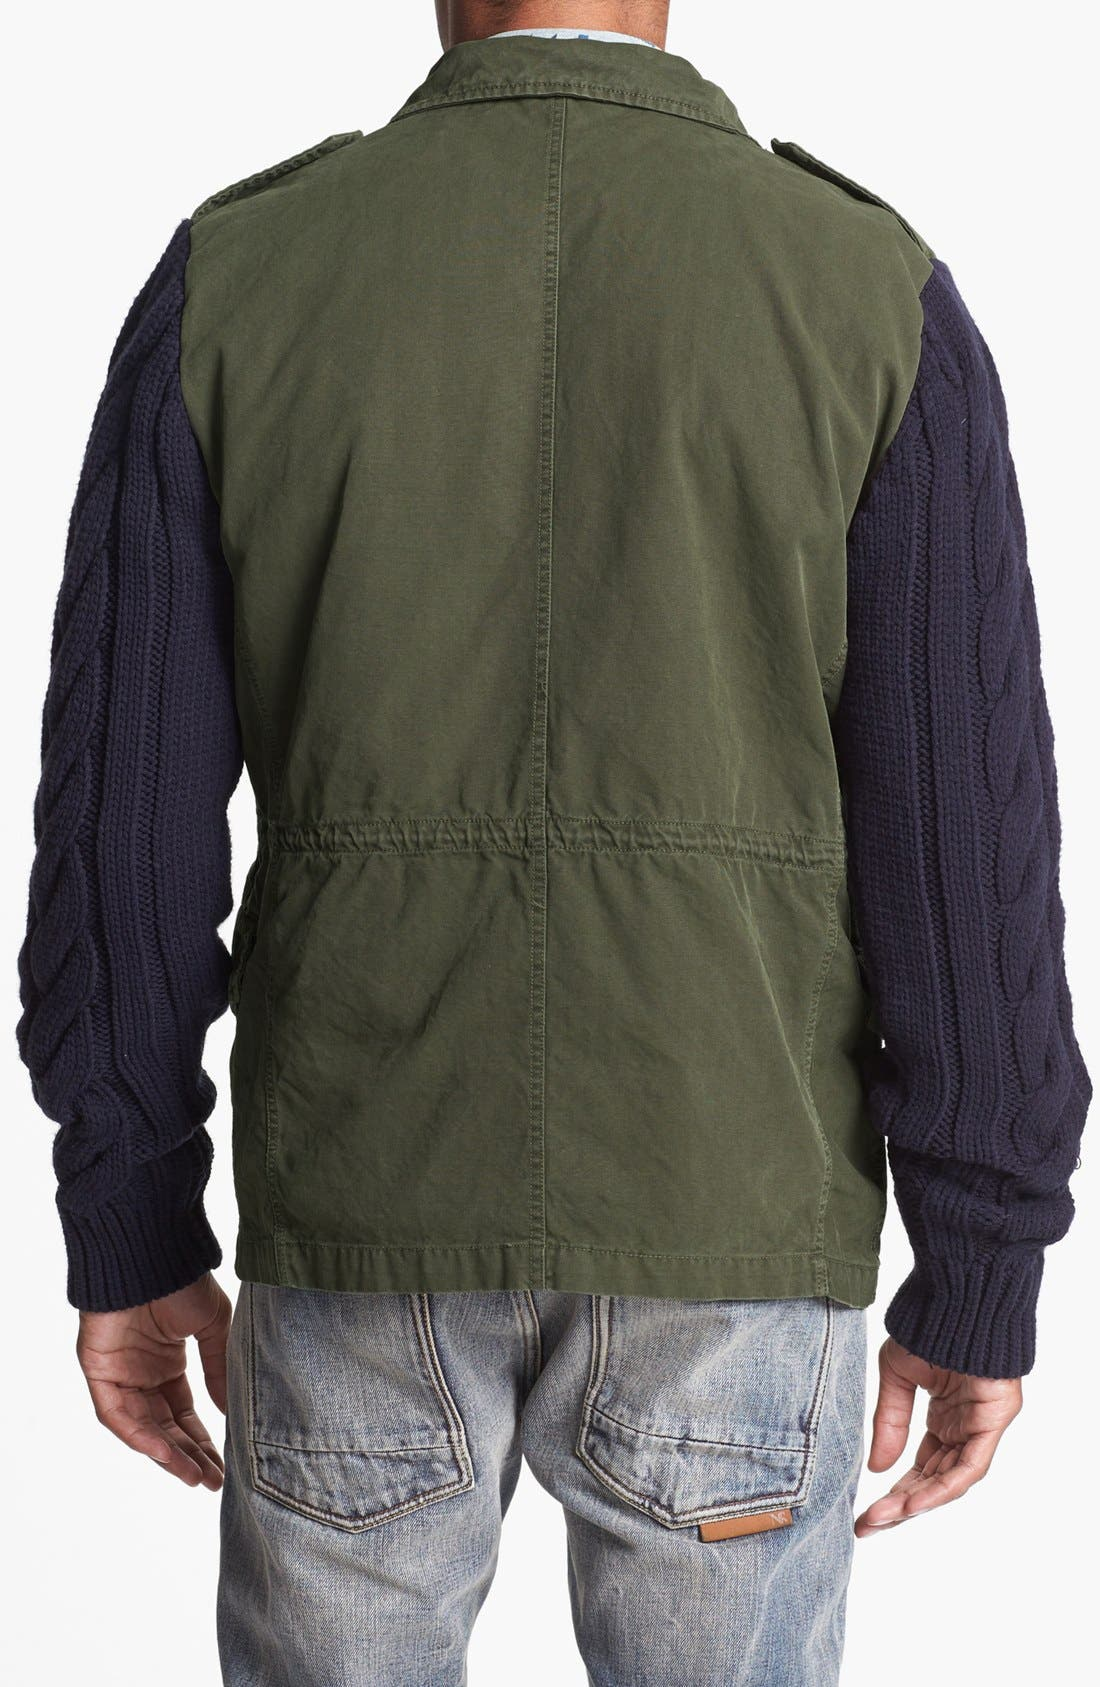 Alternate Image 2  - Scotch & Soda Military Jacket with Knit Sleeves